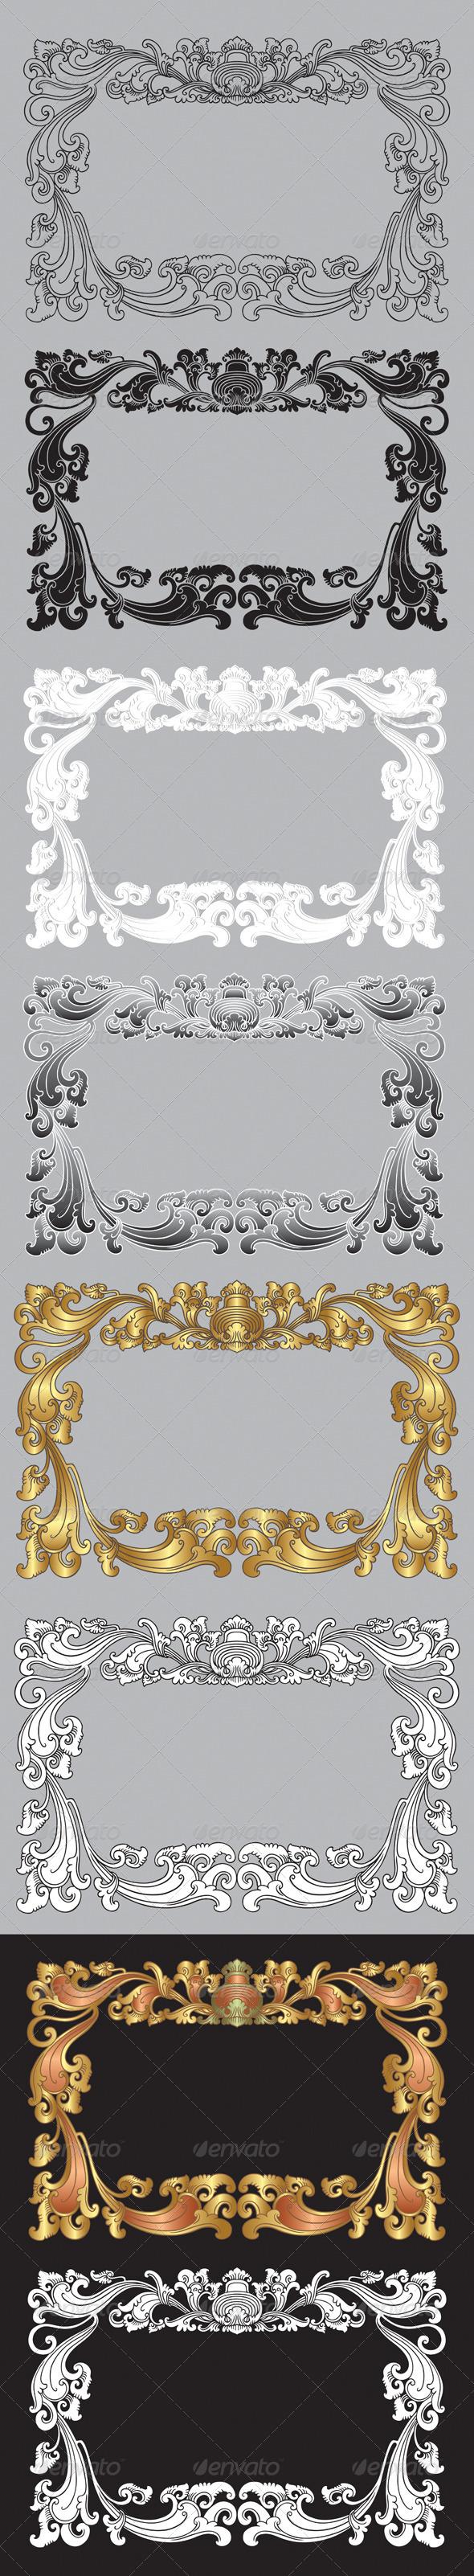 Balinese Ornament Frame 2 - Flourishes / Swirls Decorative